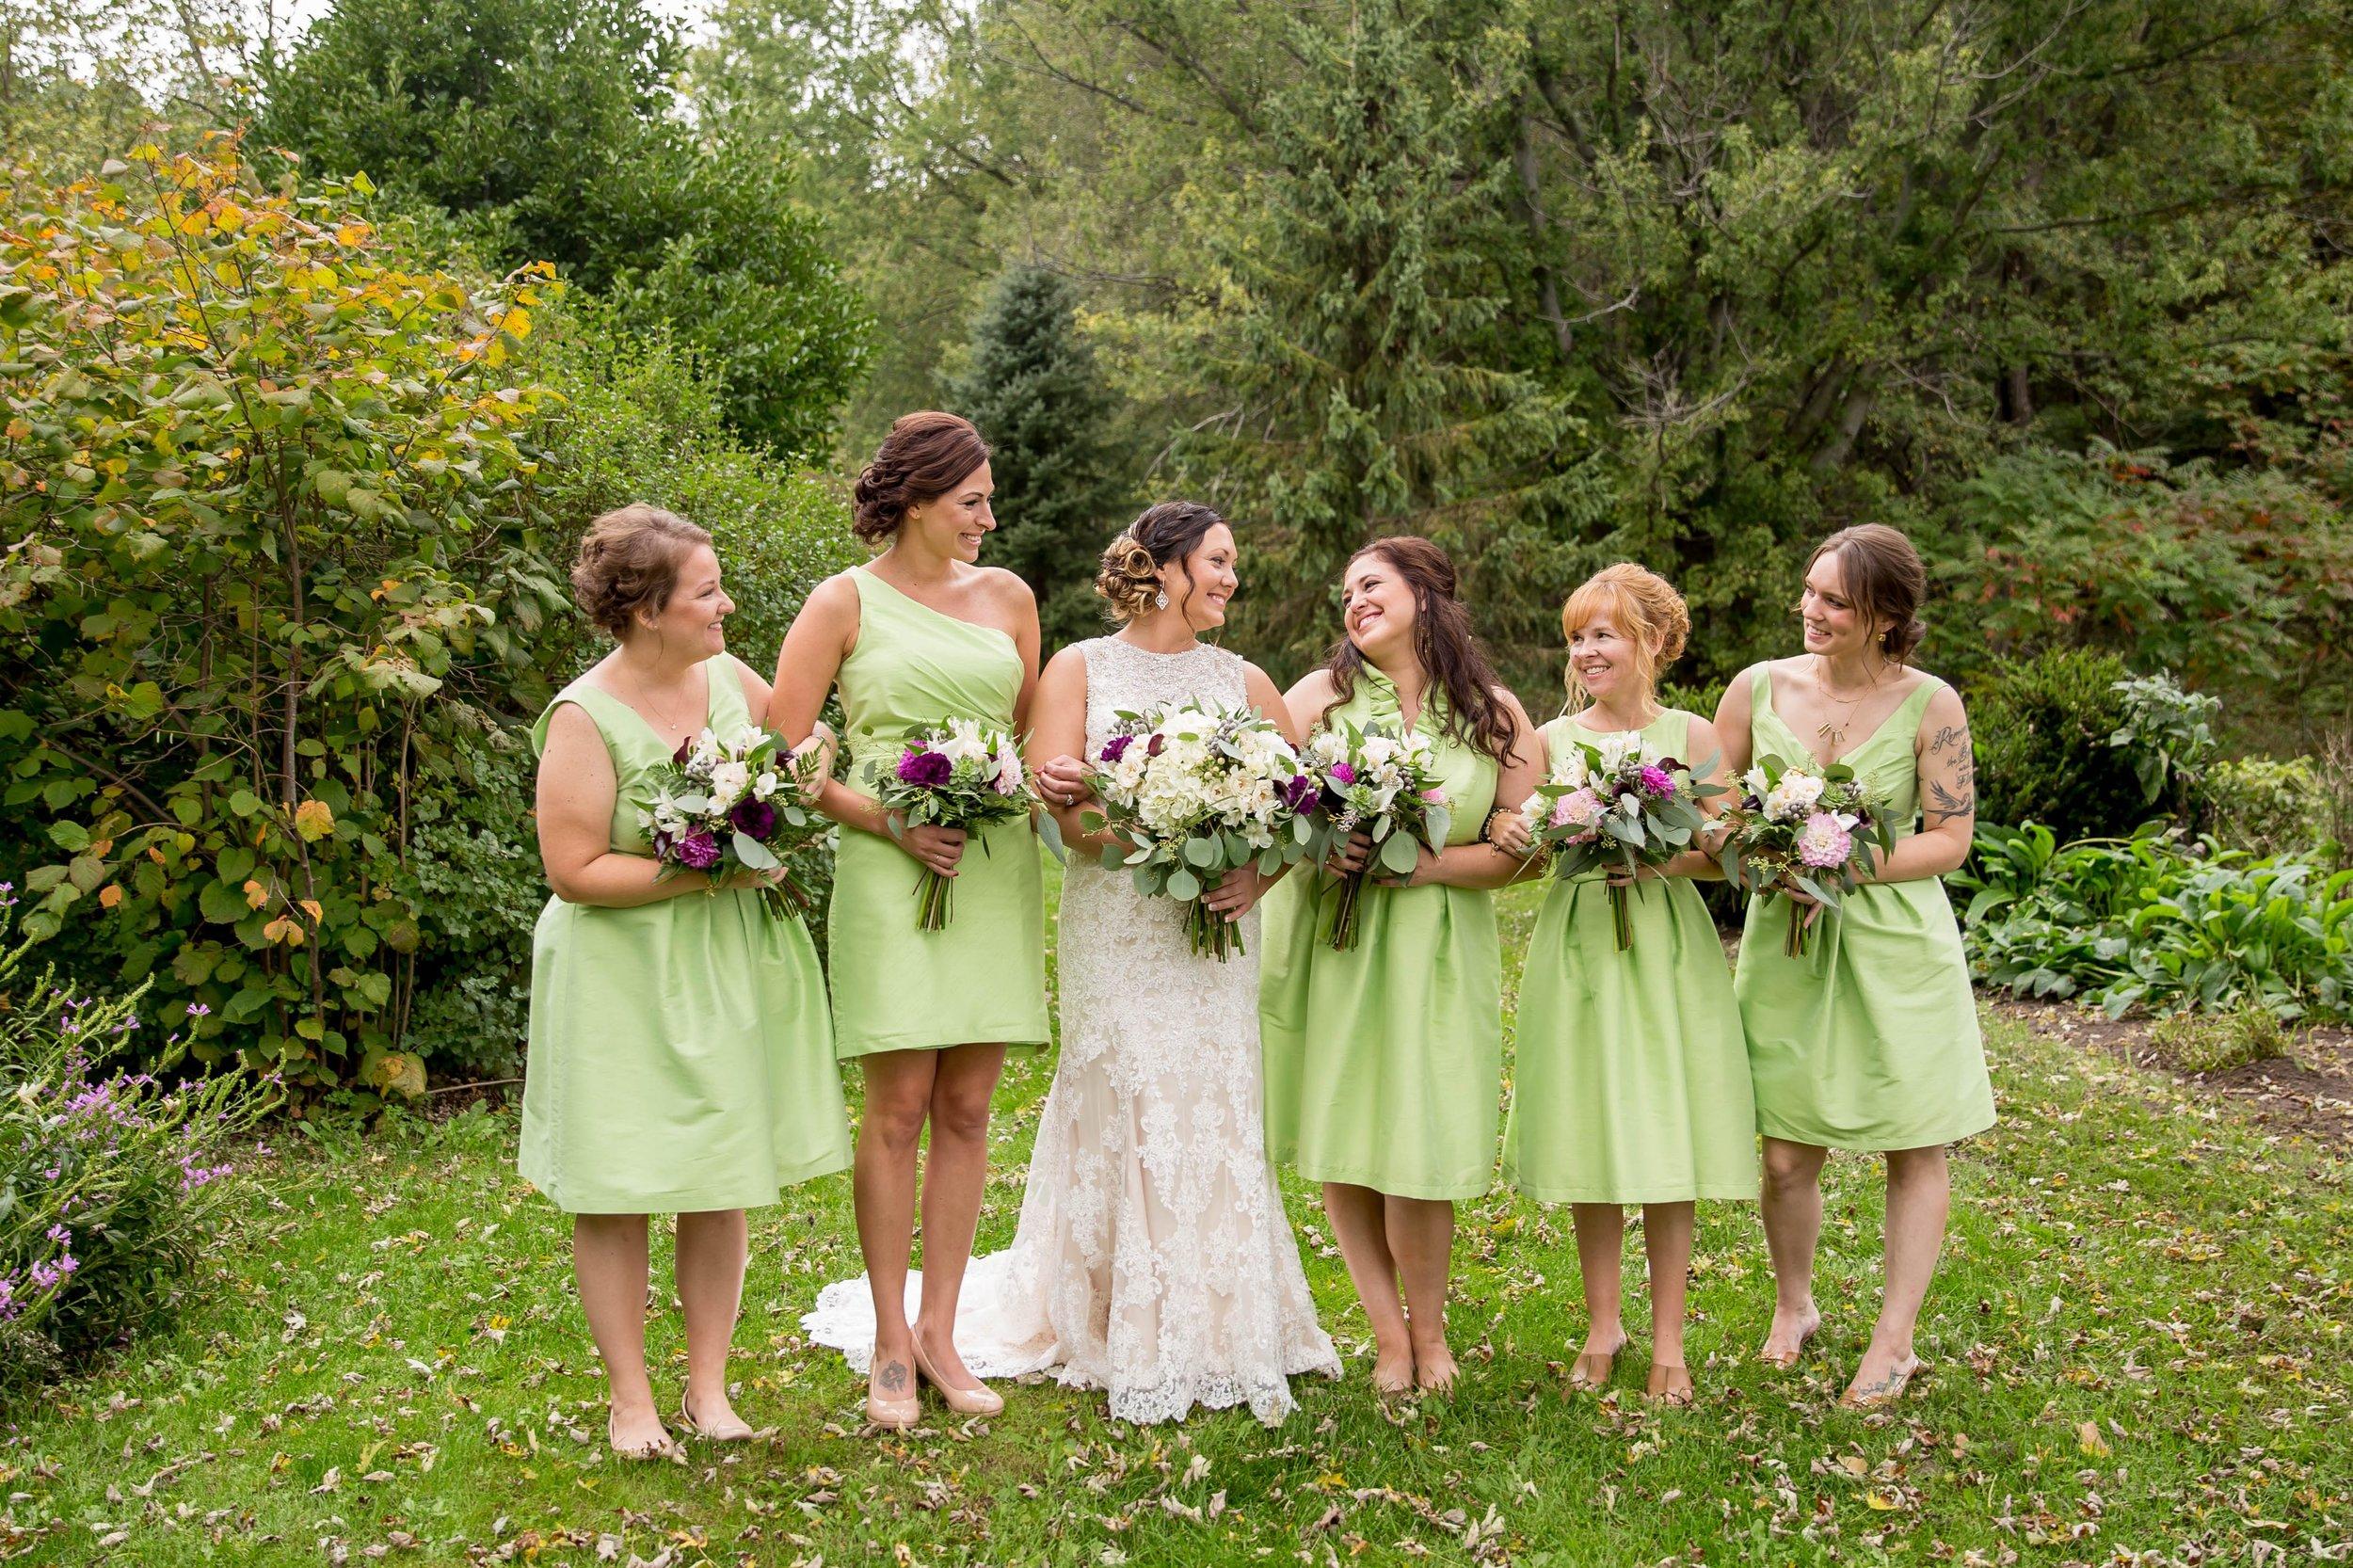 Gordon Wedding 2016-8220crop.jpg